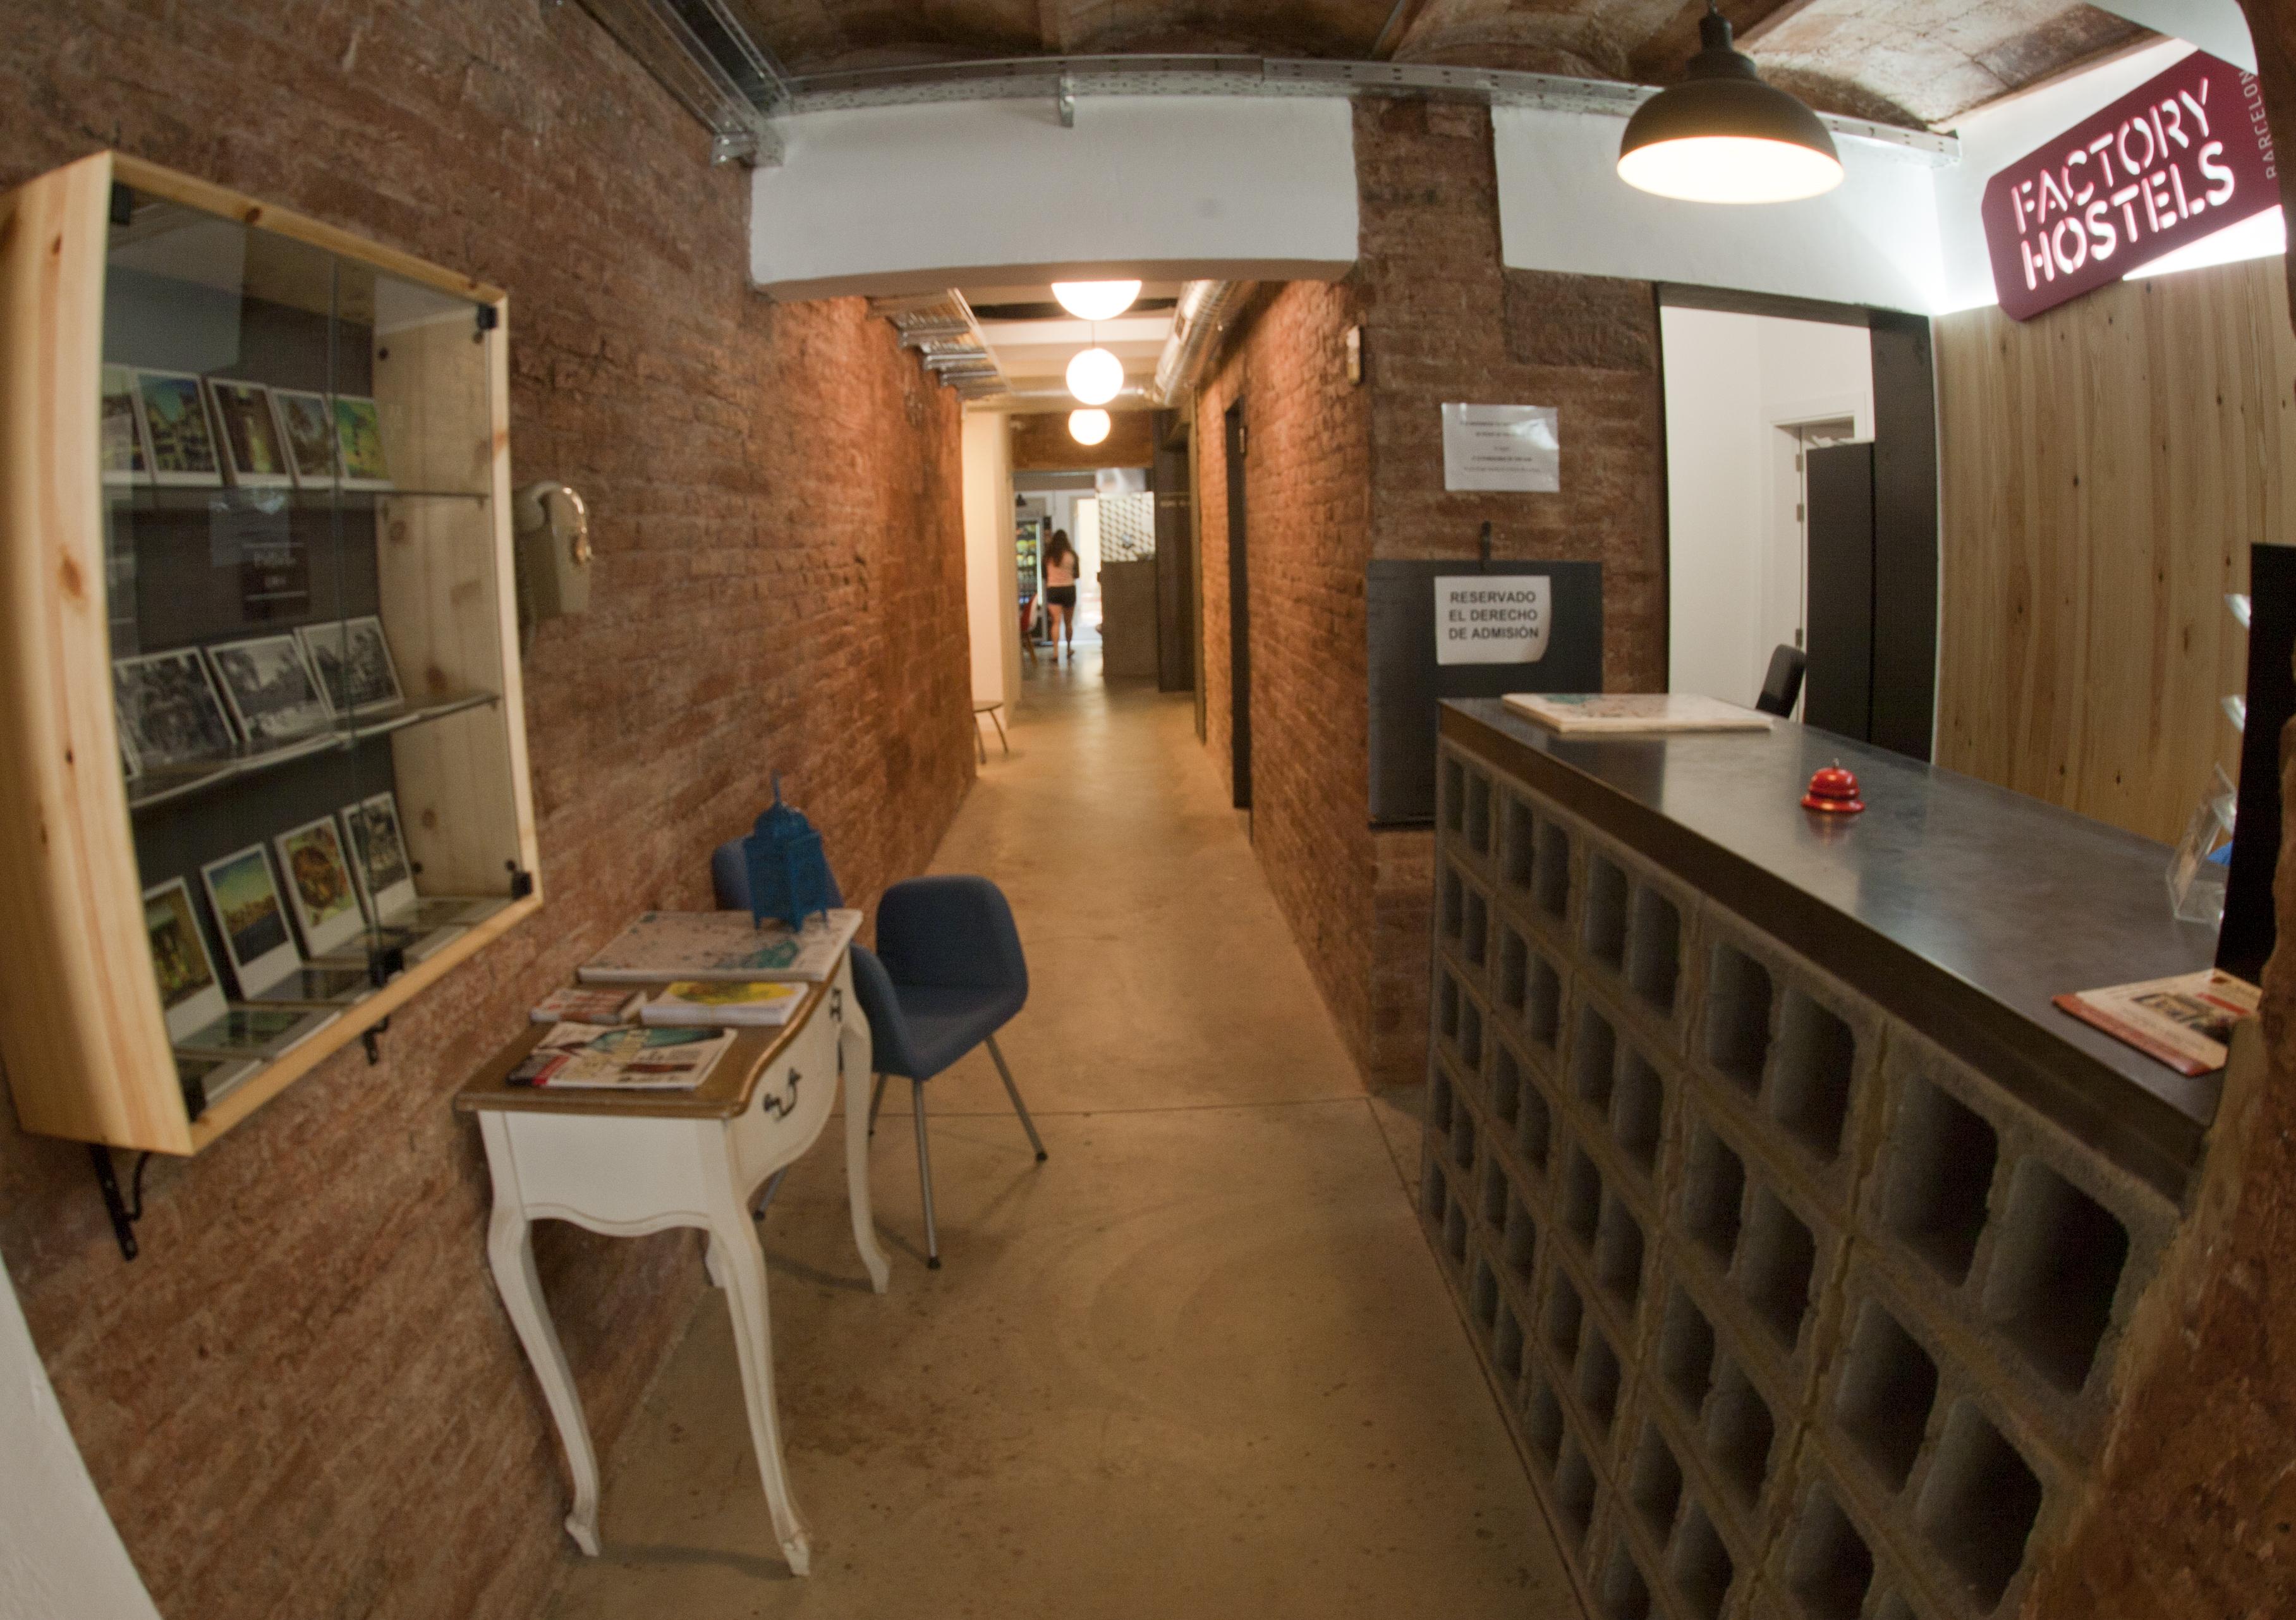 The Loft Hostel